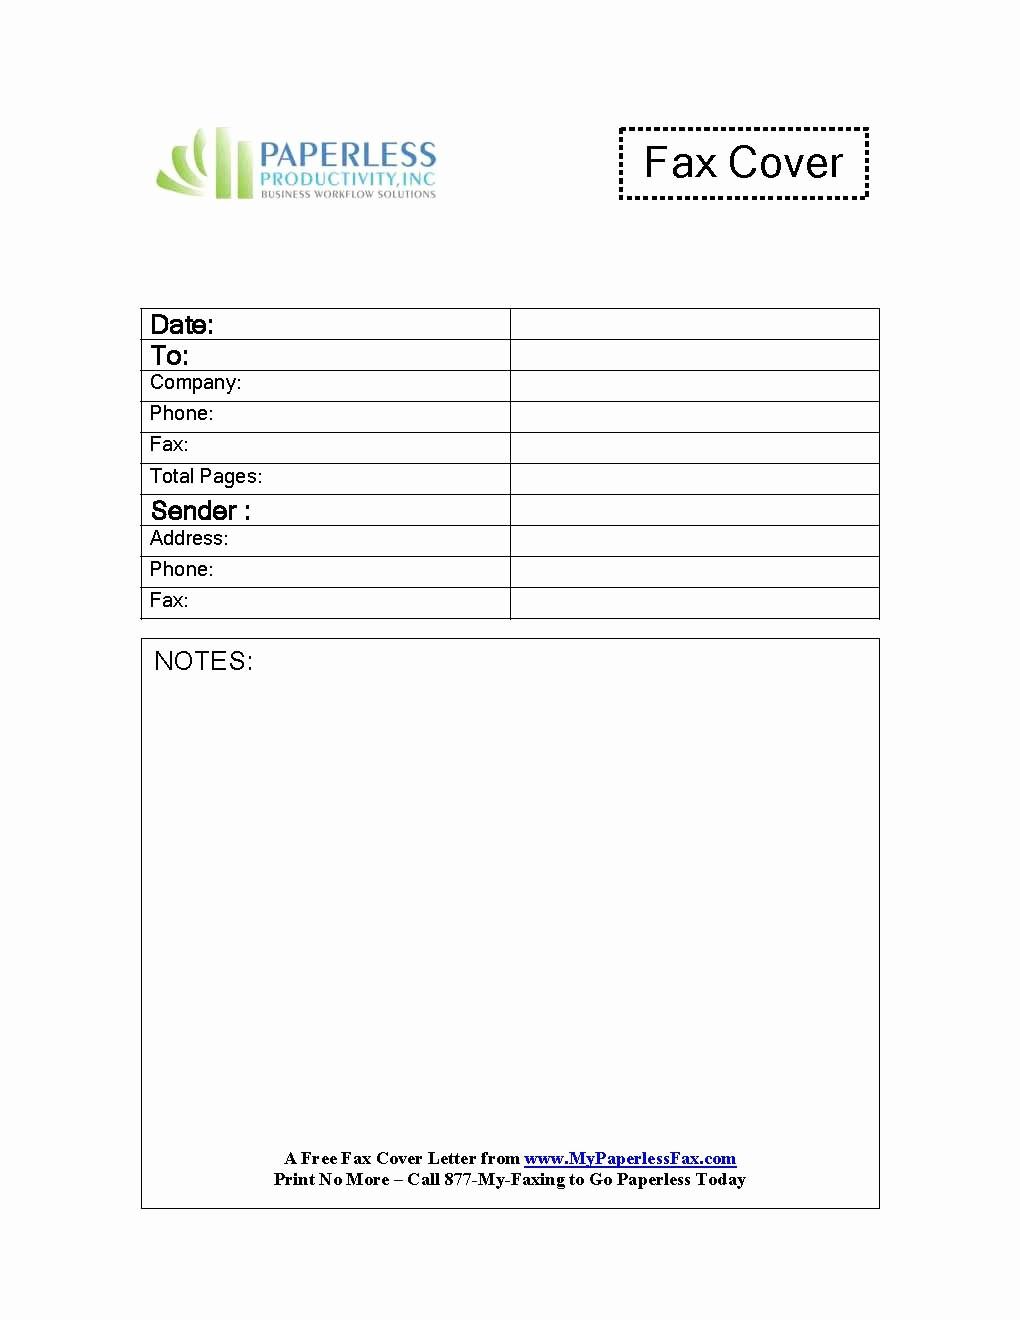 fax cover sheet google doc